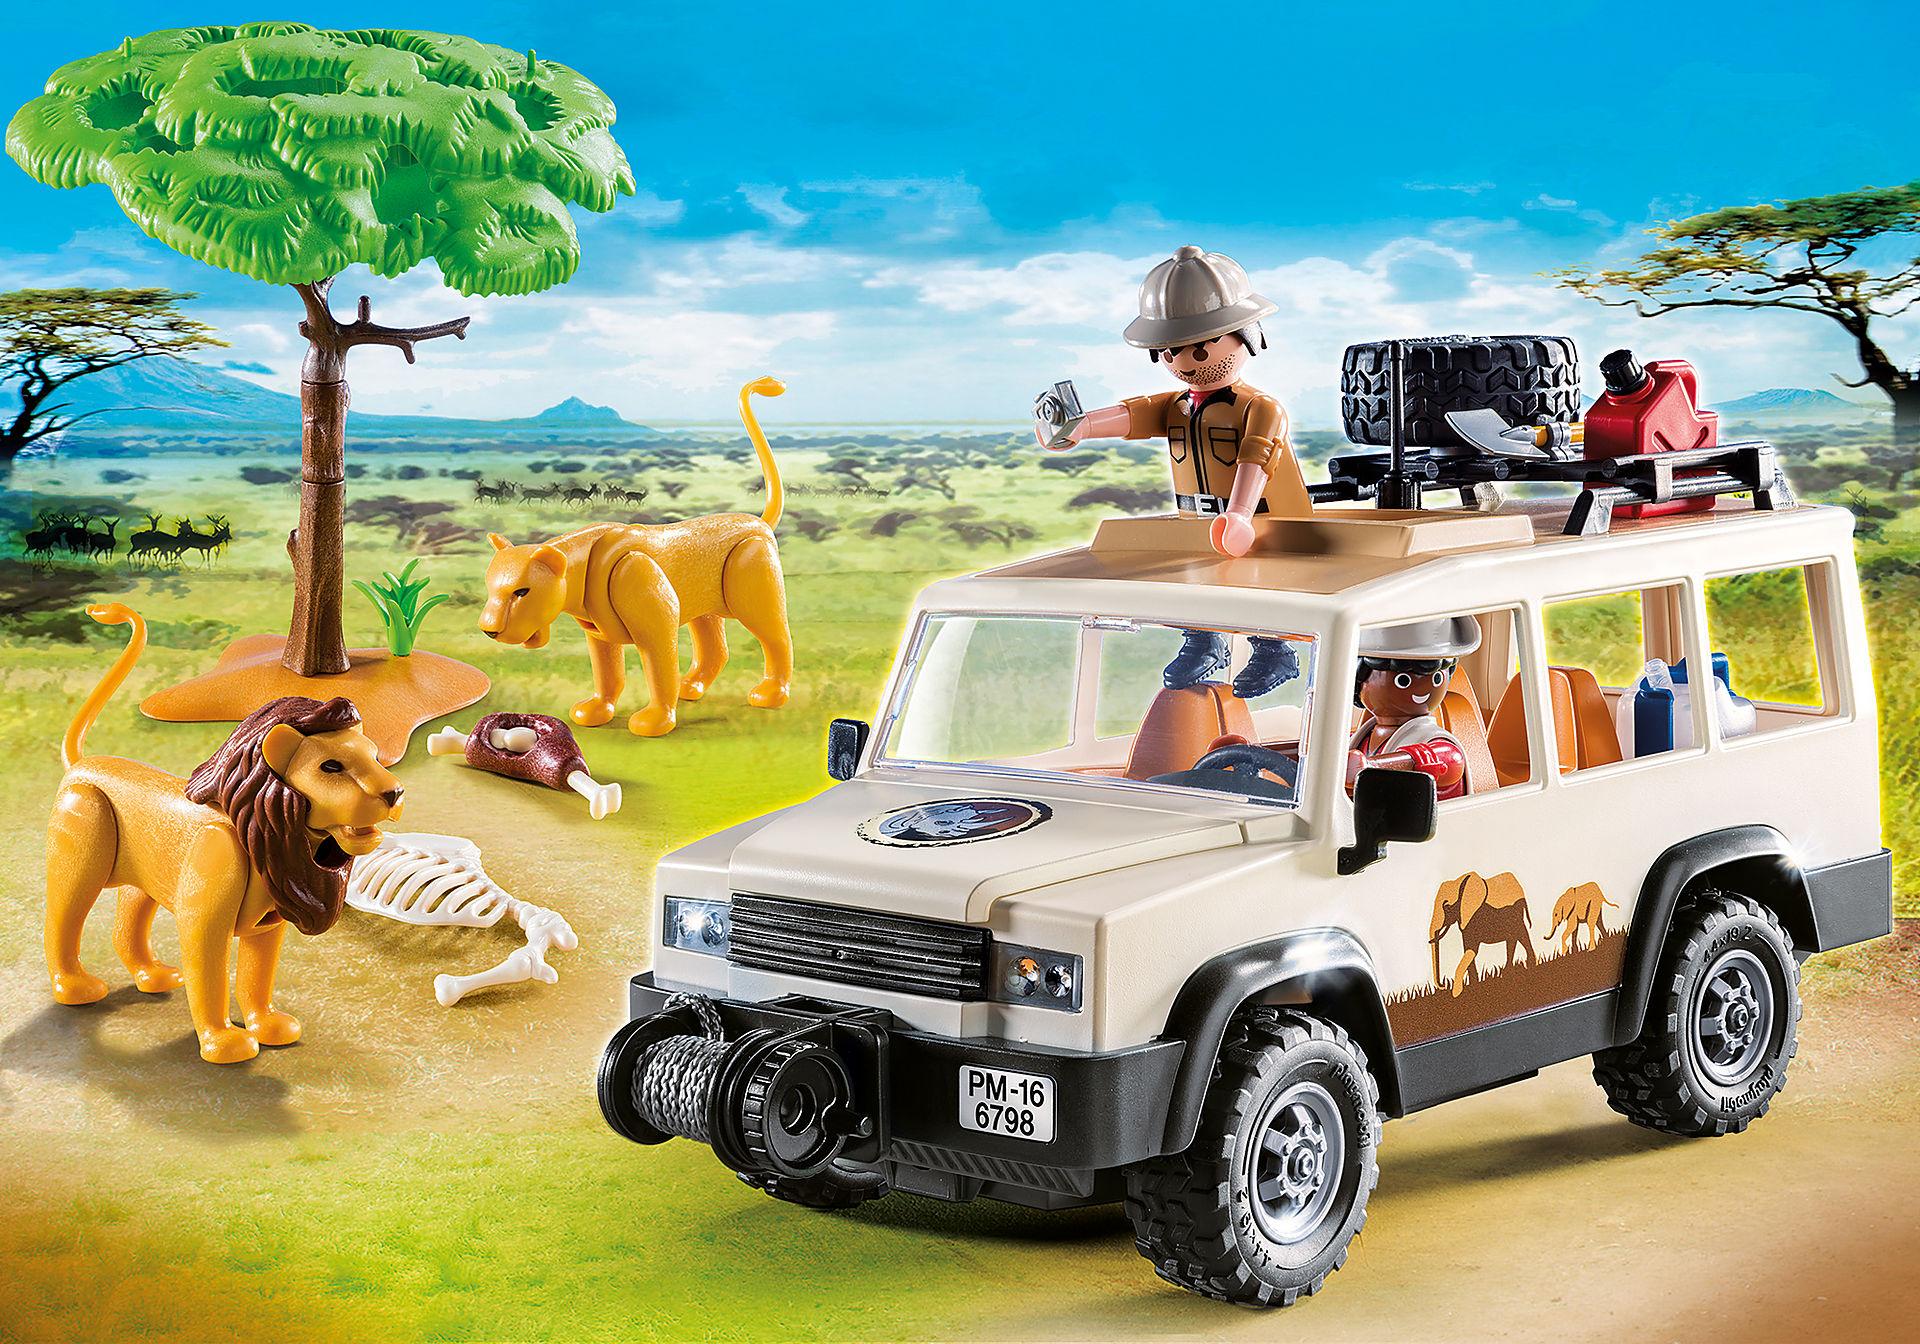 http://media.playmobil.com/i/playmobil/6798_product_detail/Vehículo Safari con Leones